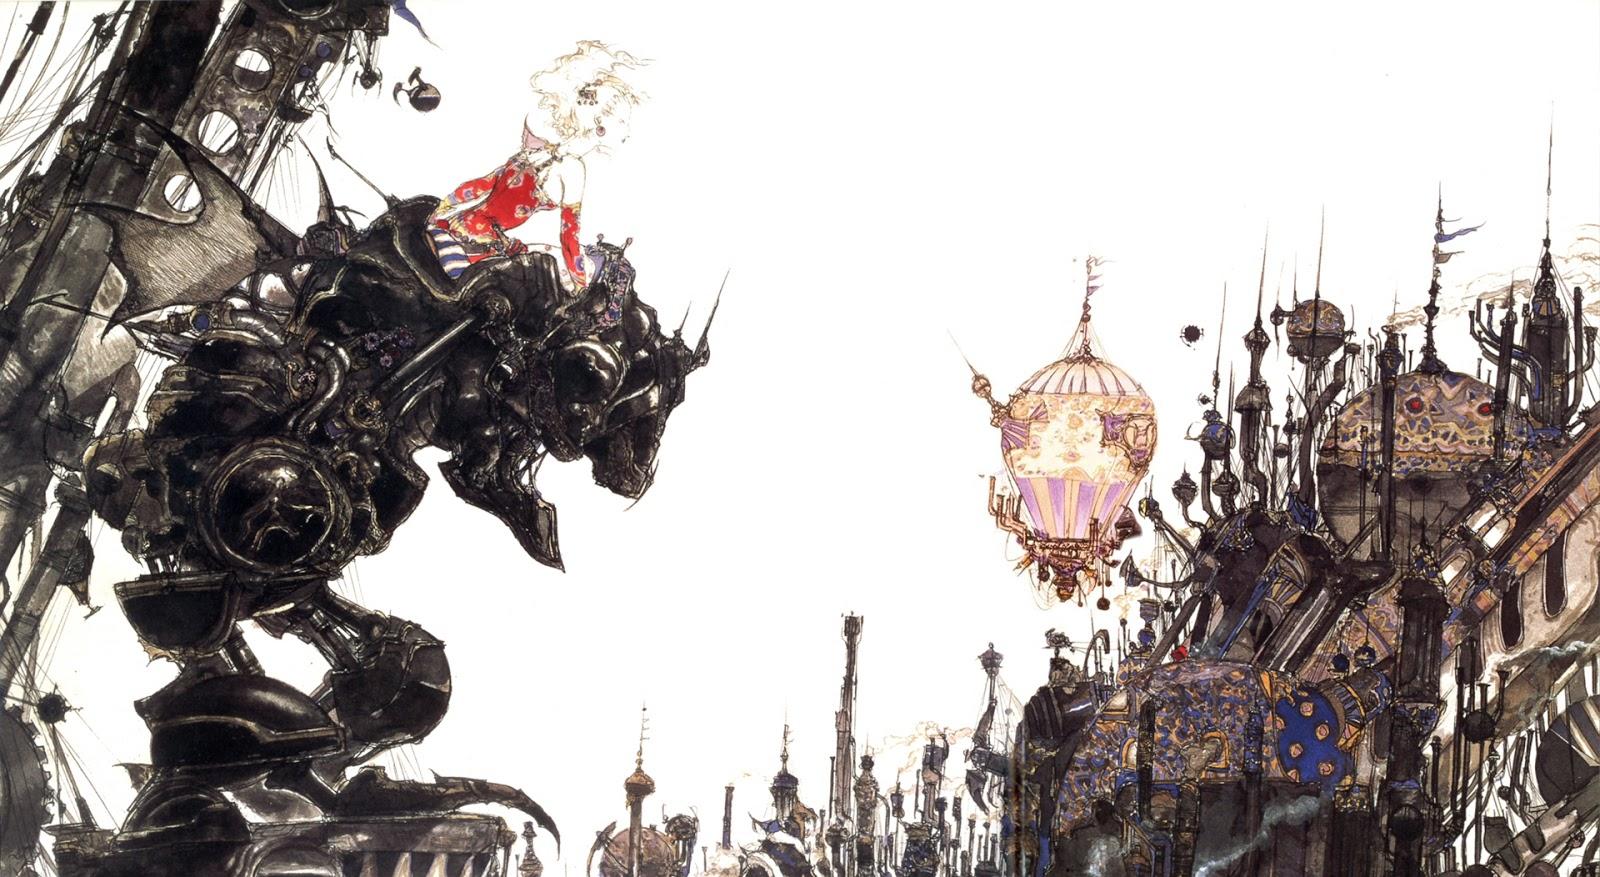 FF6 illustration by Yoshitaka Amano